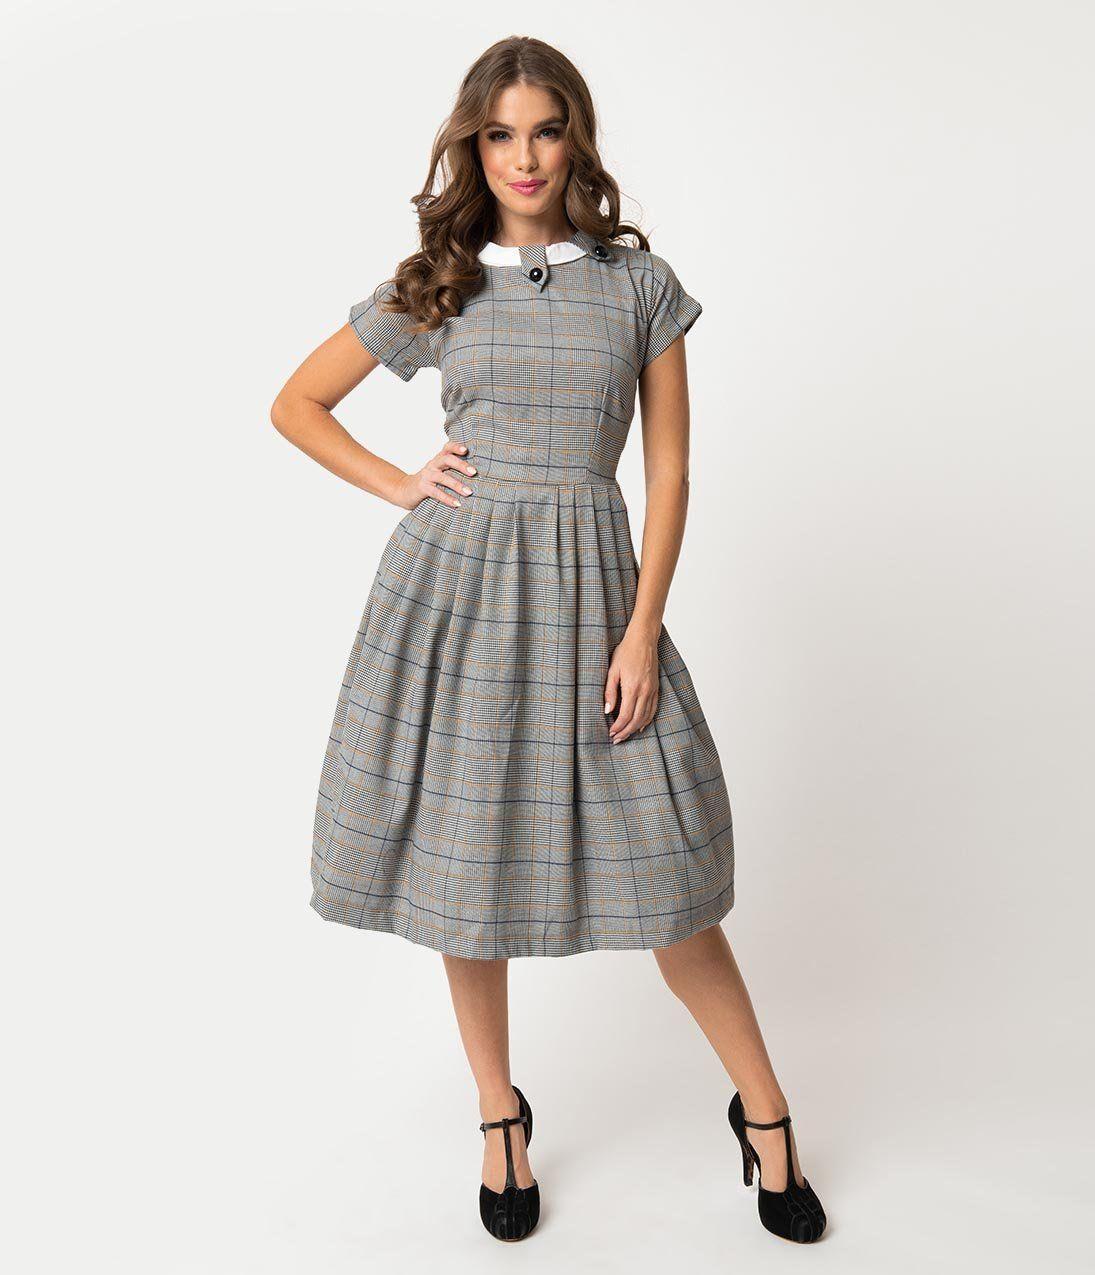 Beatrice Short: Retro Style Grey Plaid Check Short Sleeve Beatrice Swing